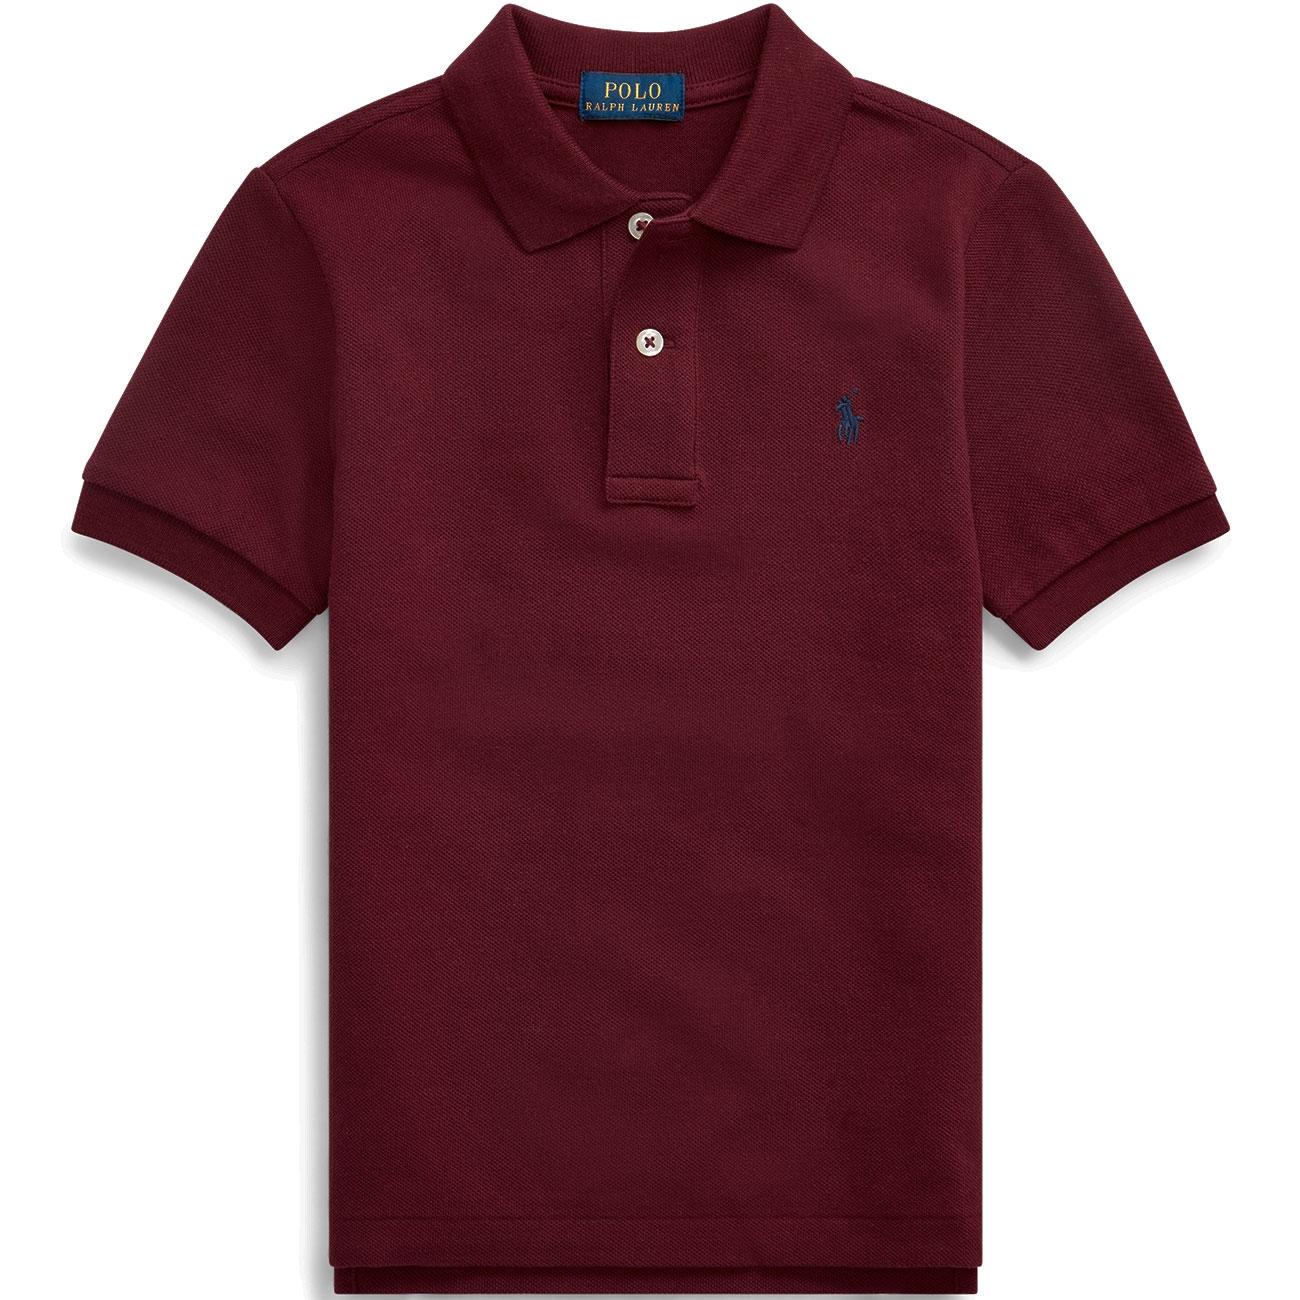 Polo Ralph Lauren Boys Red Burgundy Short Sleeve Polo Shirt